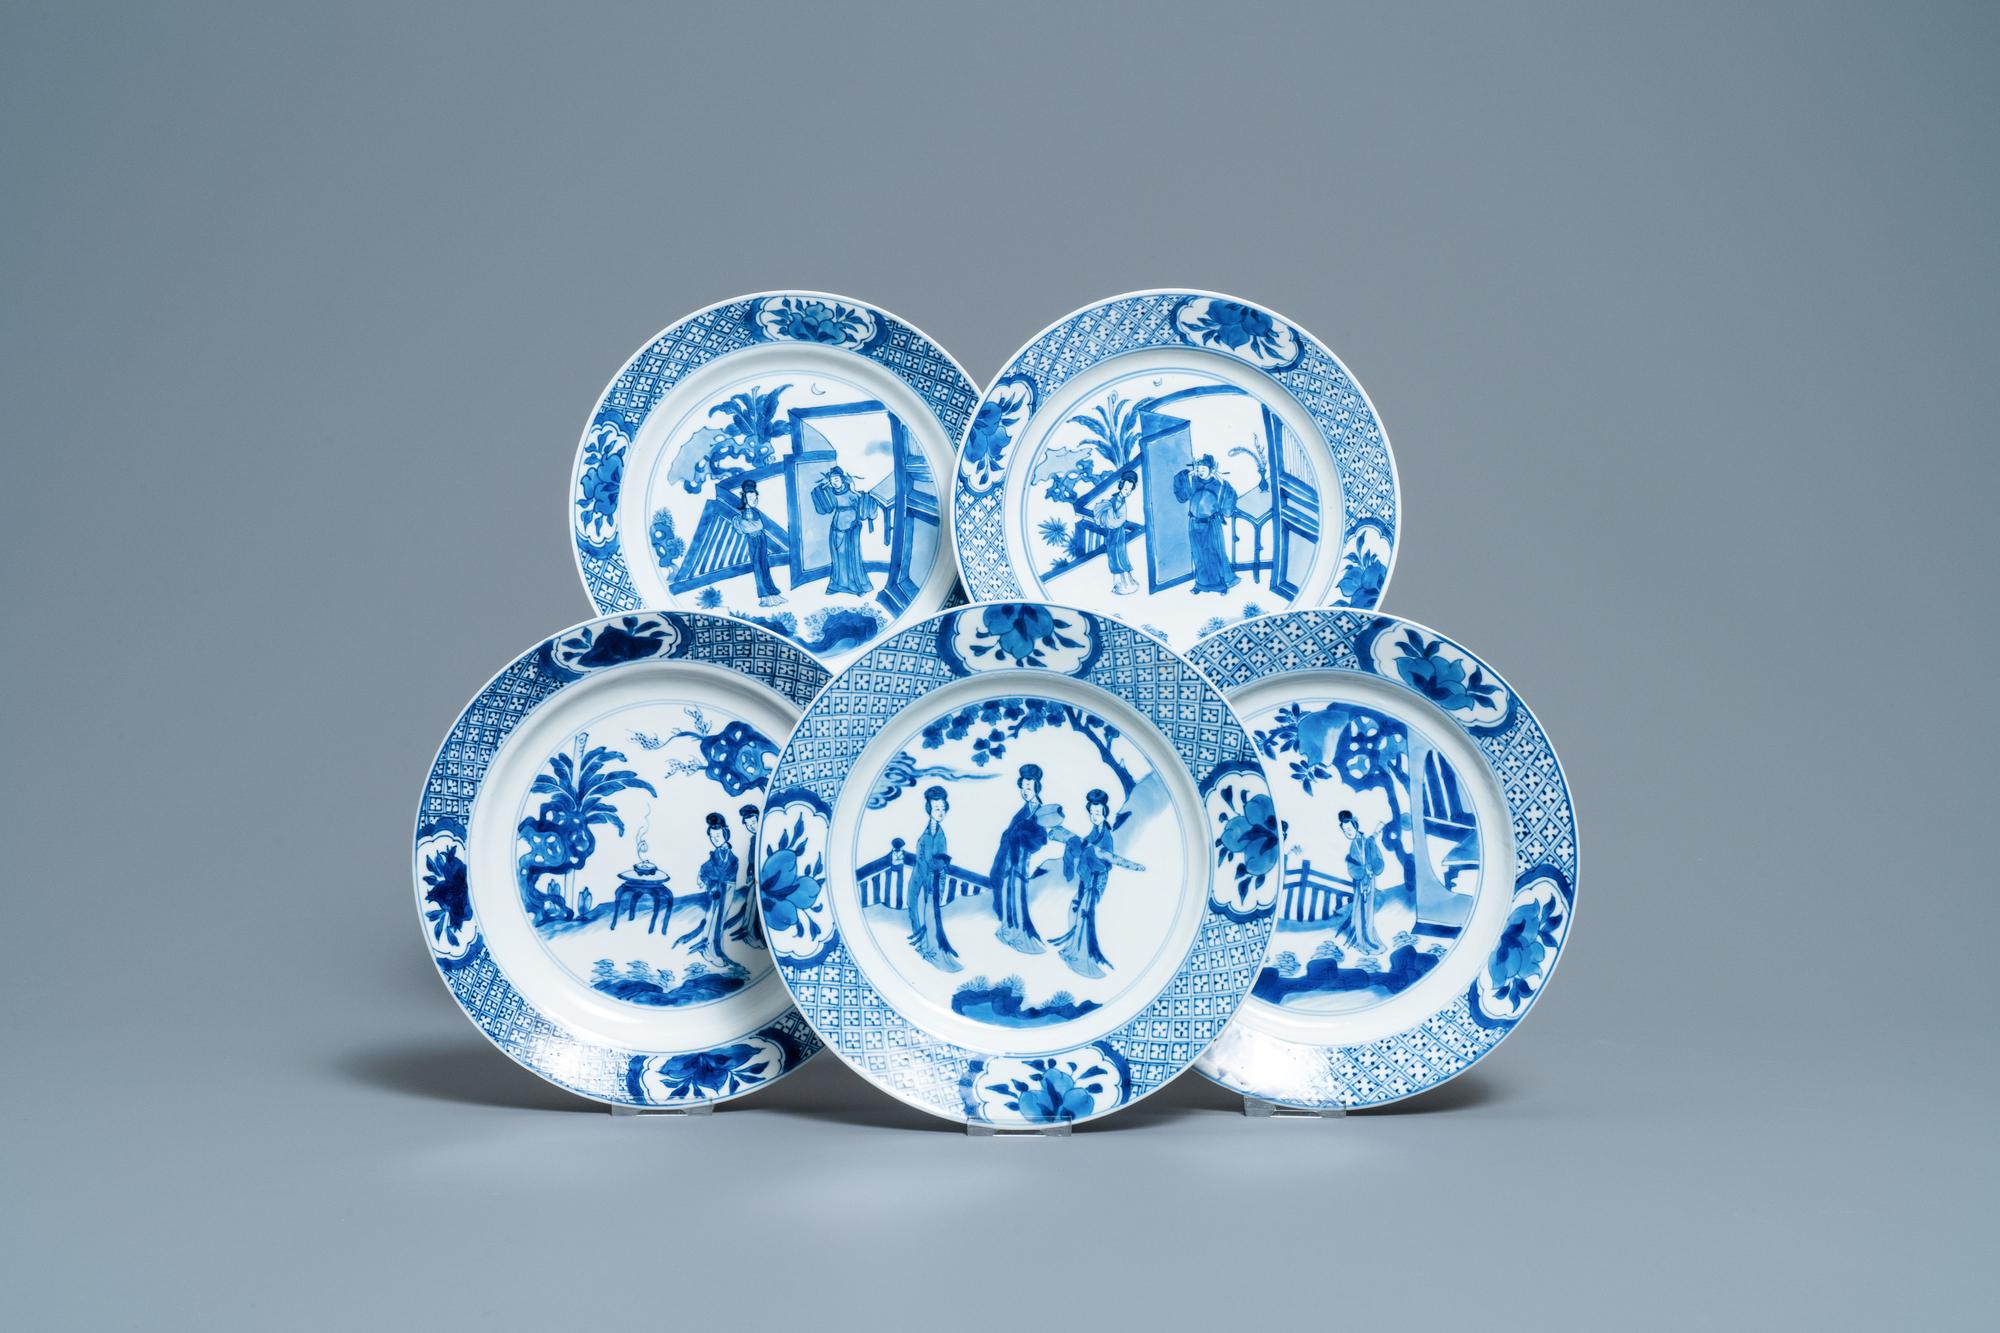 Five Chinese blue and white figurative plates, Kangxi and Chenghua marks, Kangxi